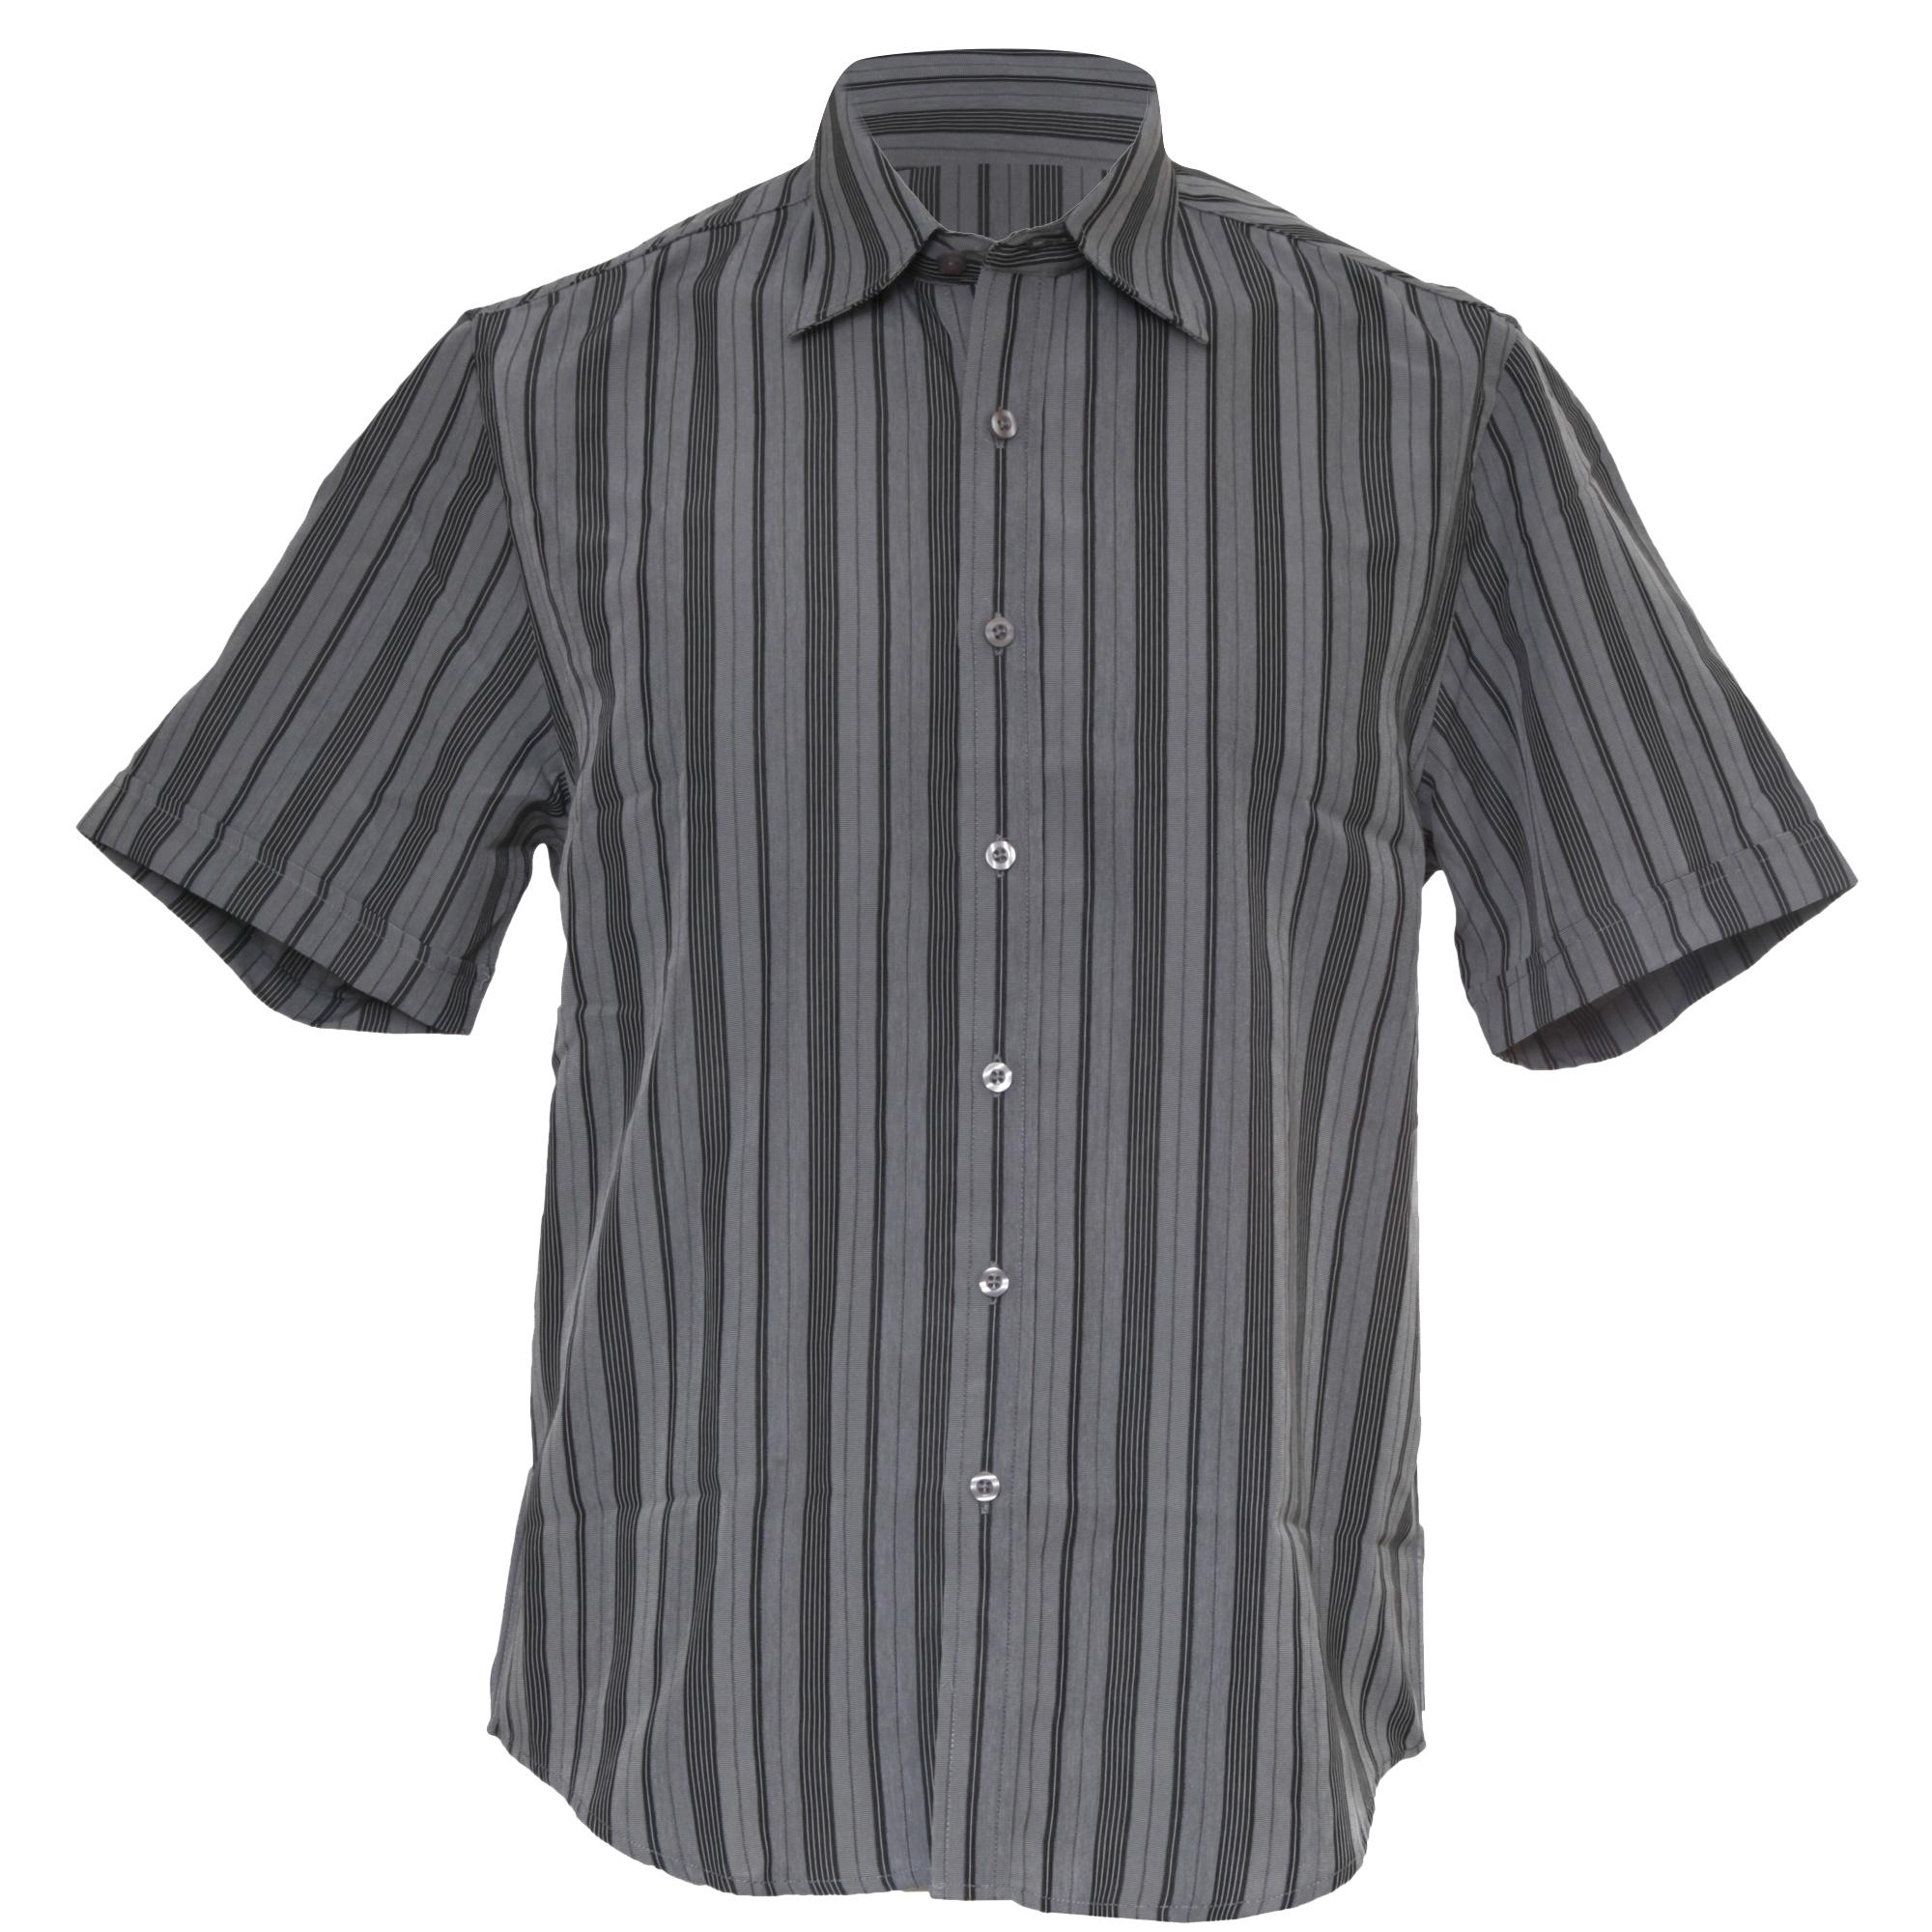 Ben smith mens short sleeve striped shirt ebay for Mens short sleeve patterned shirts